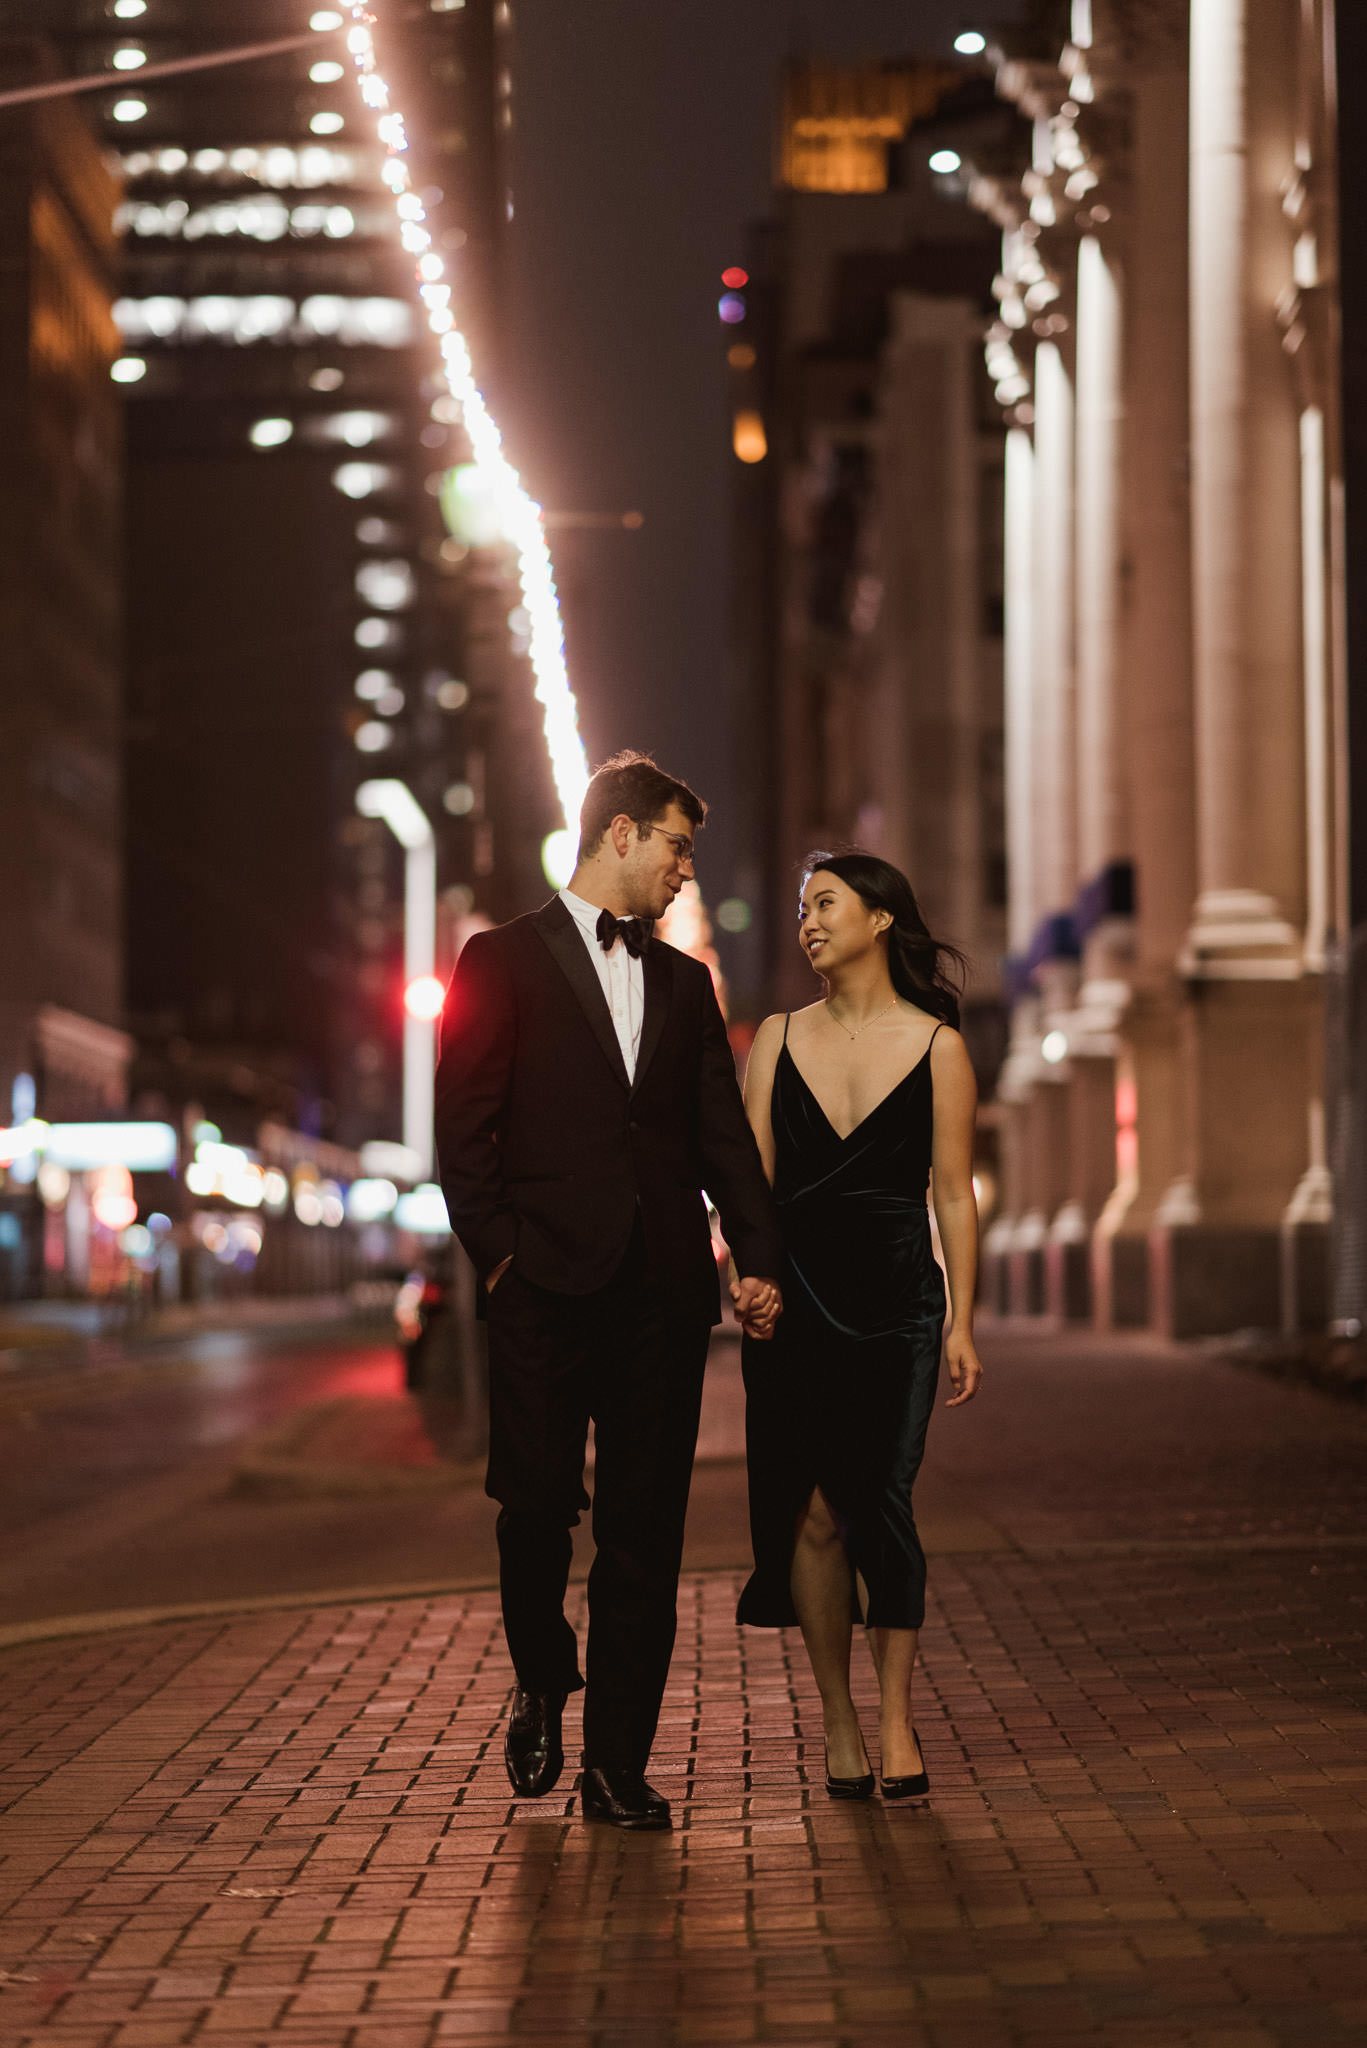 houston-downtown-mainstreet-urban-moody-engagement-photographer